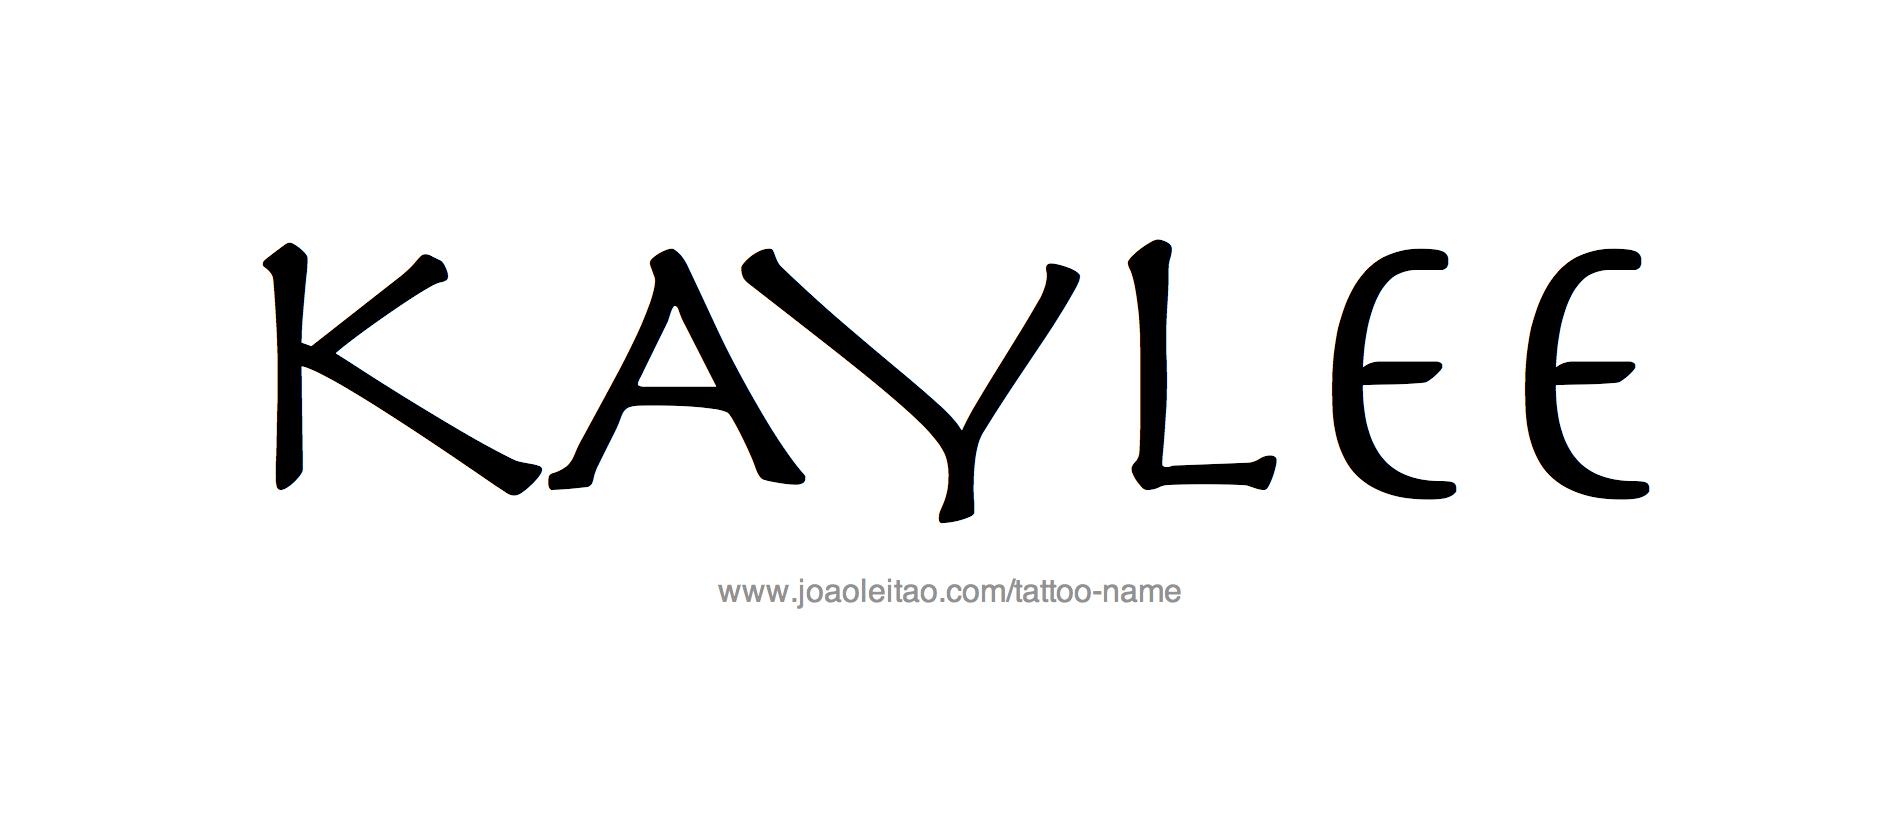 Name: Kaylee Name Tattoo Designs